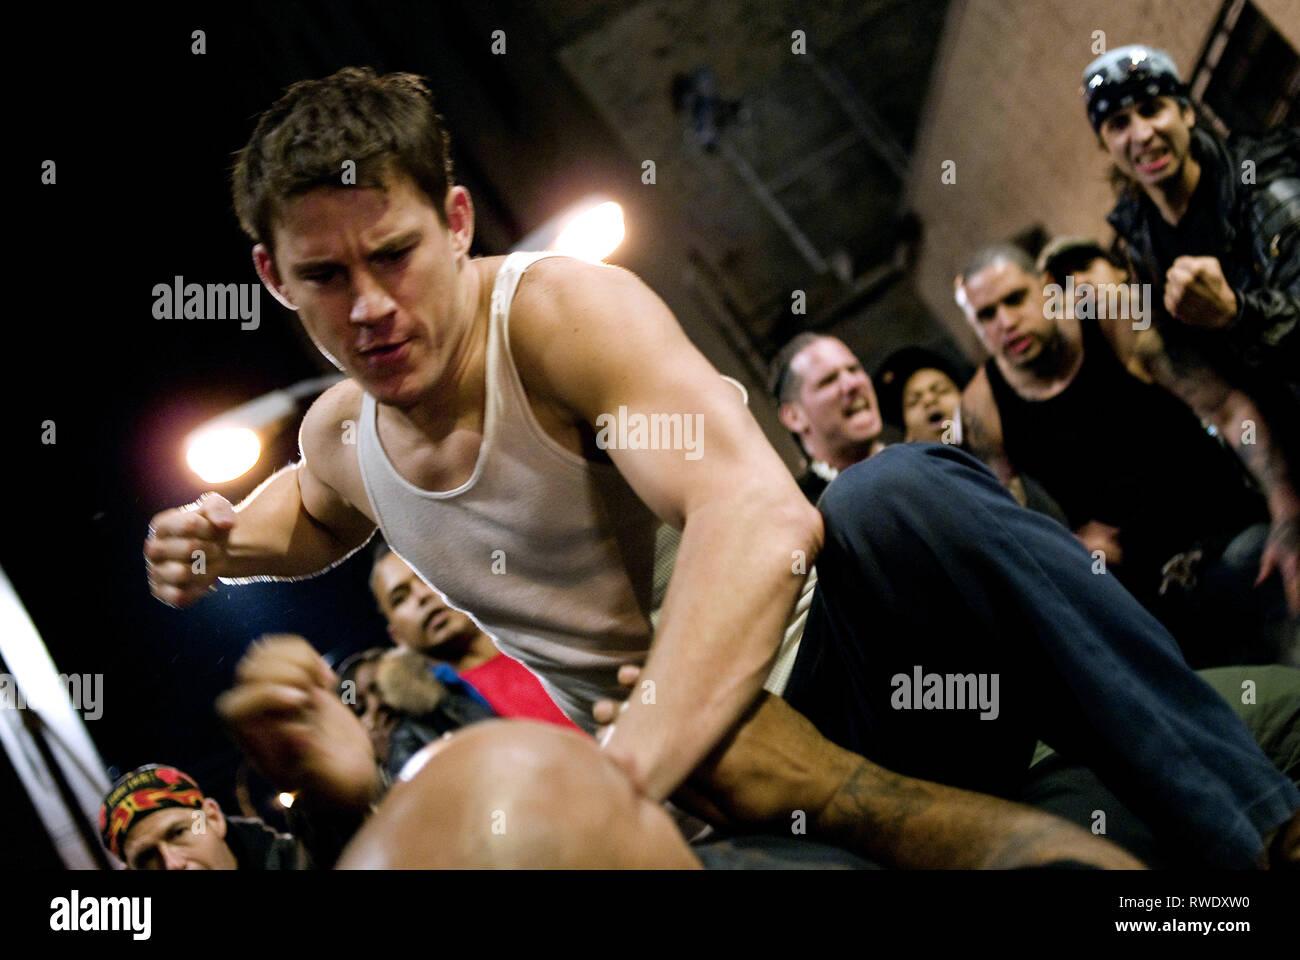 CHANNING TATUM, combattimento, 2009 Immagini Stock